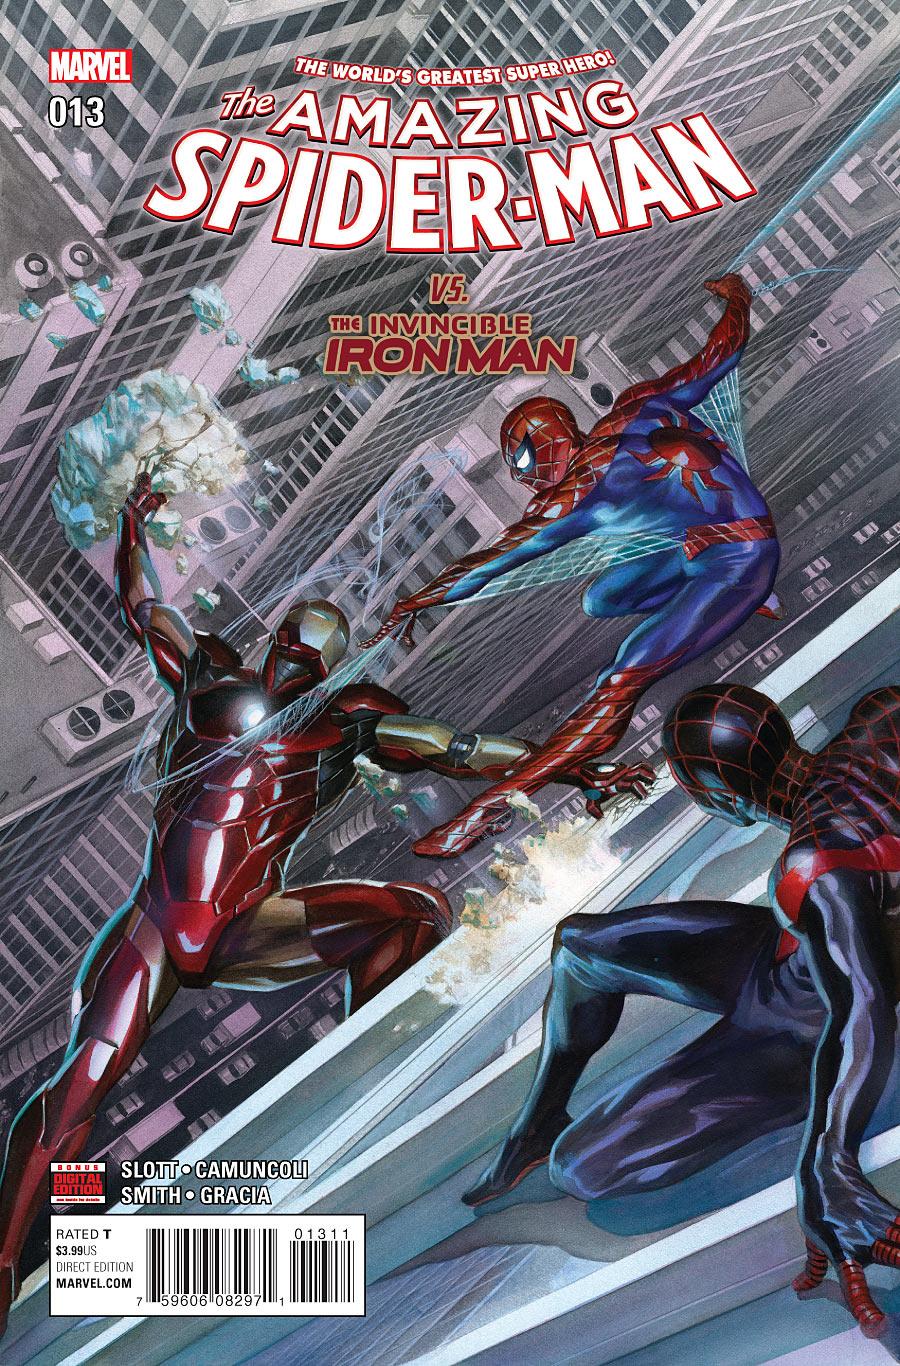 The Amazing Spider-Man #13